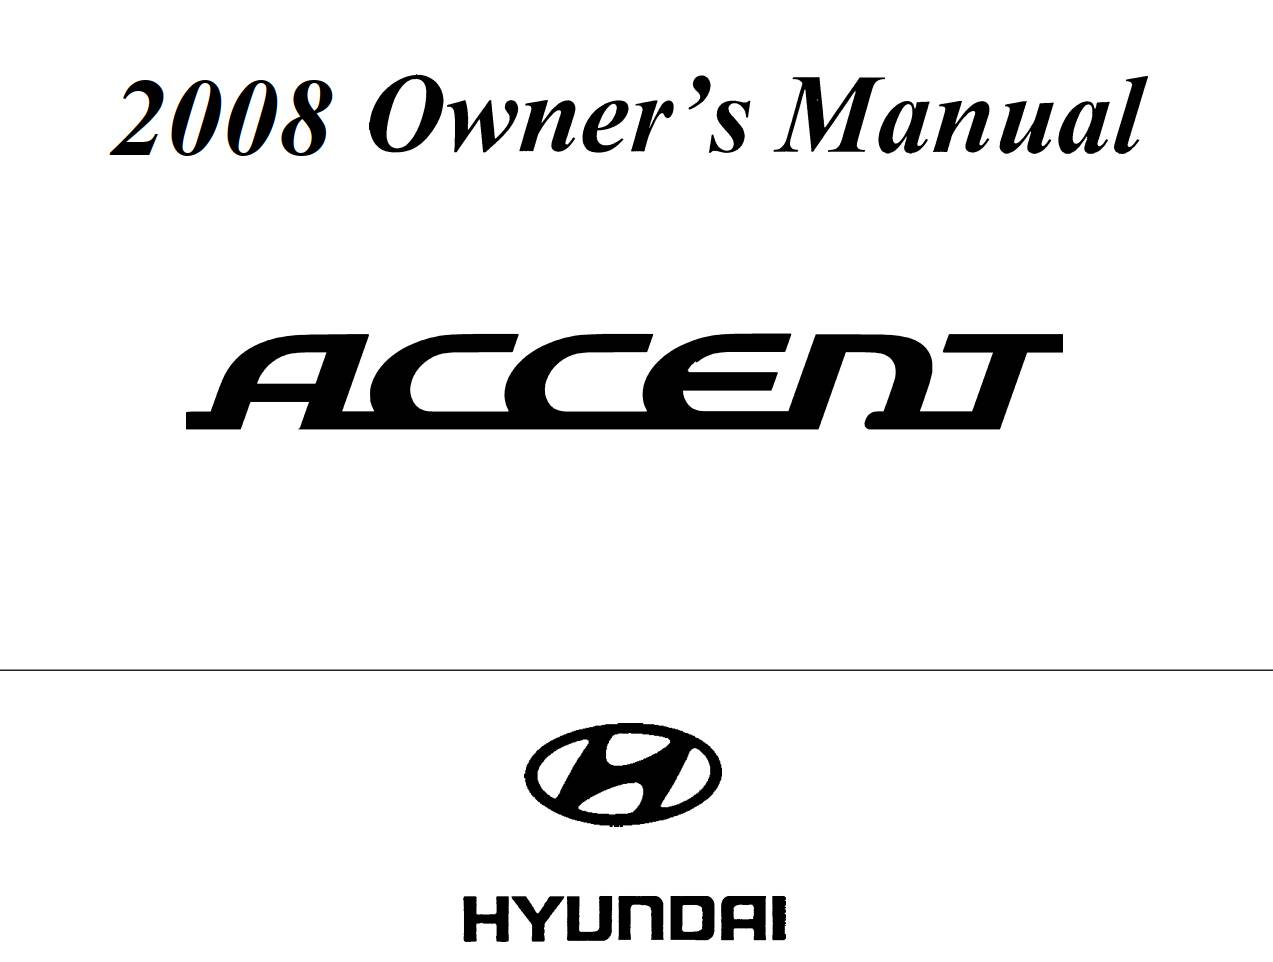 Hyundai Accent 2008 Owner's Manual